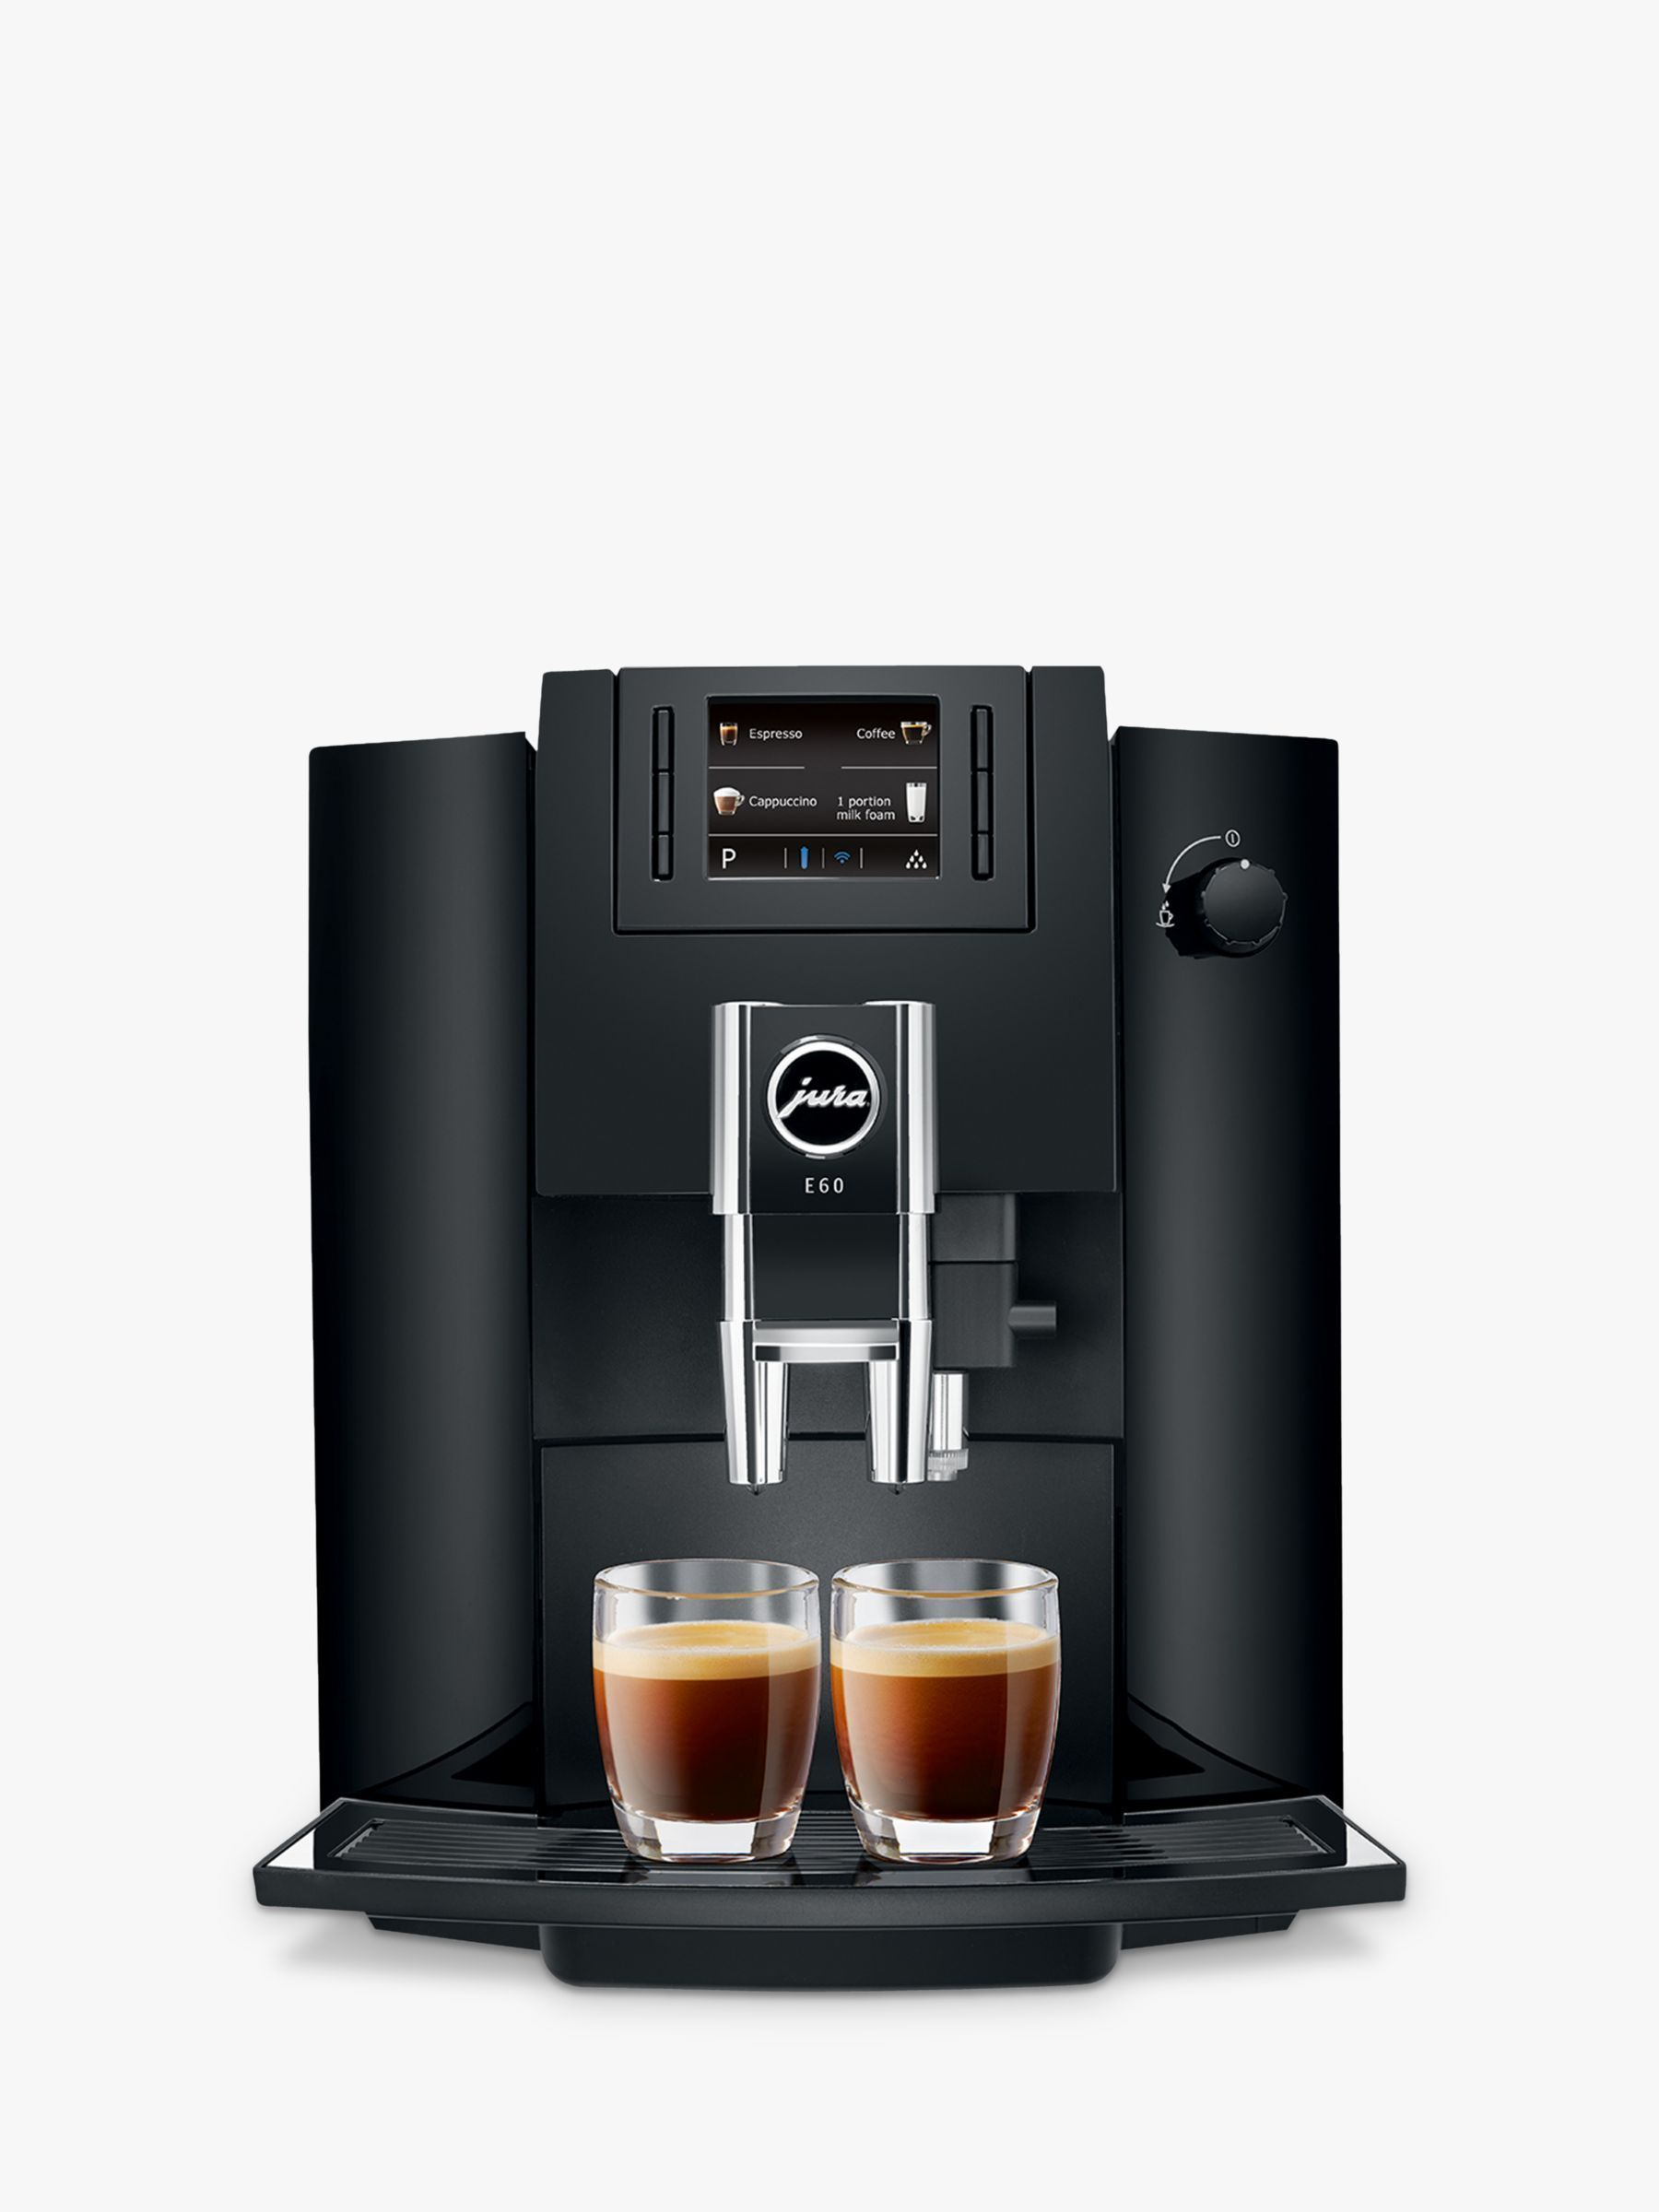 jura coffee maker how to use